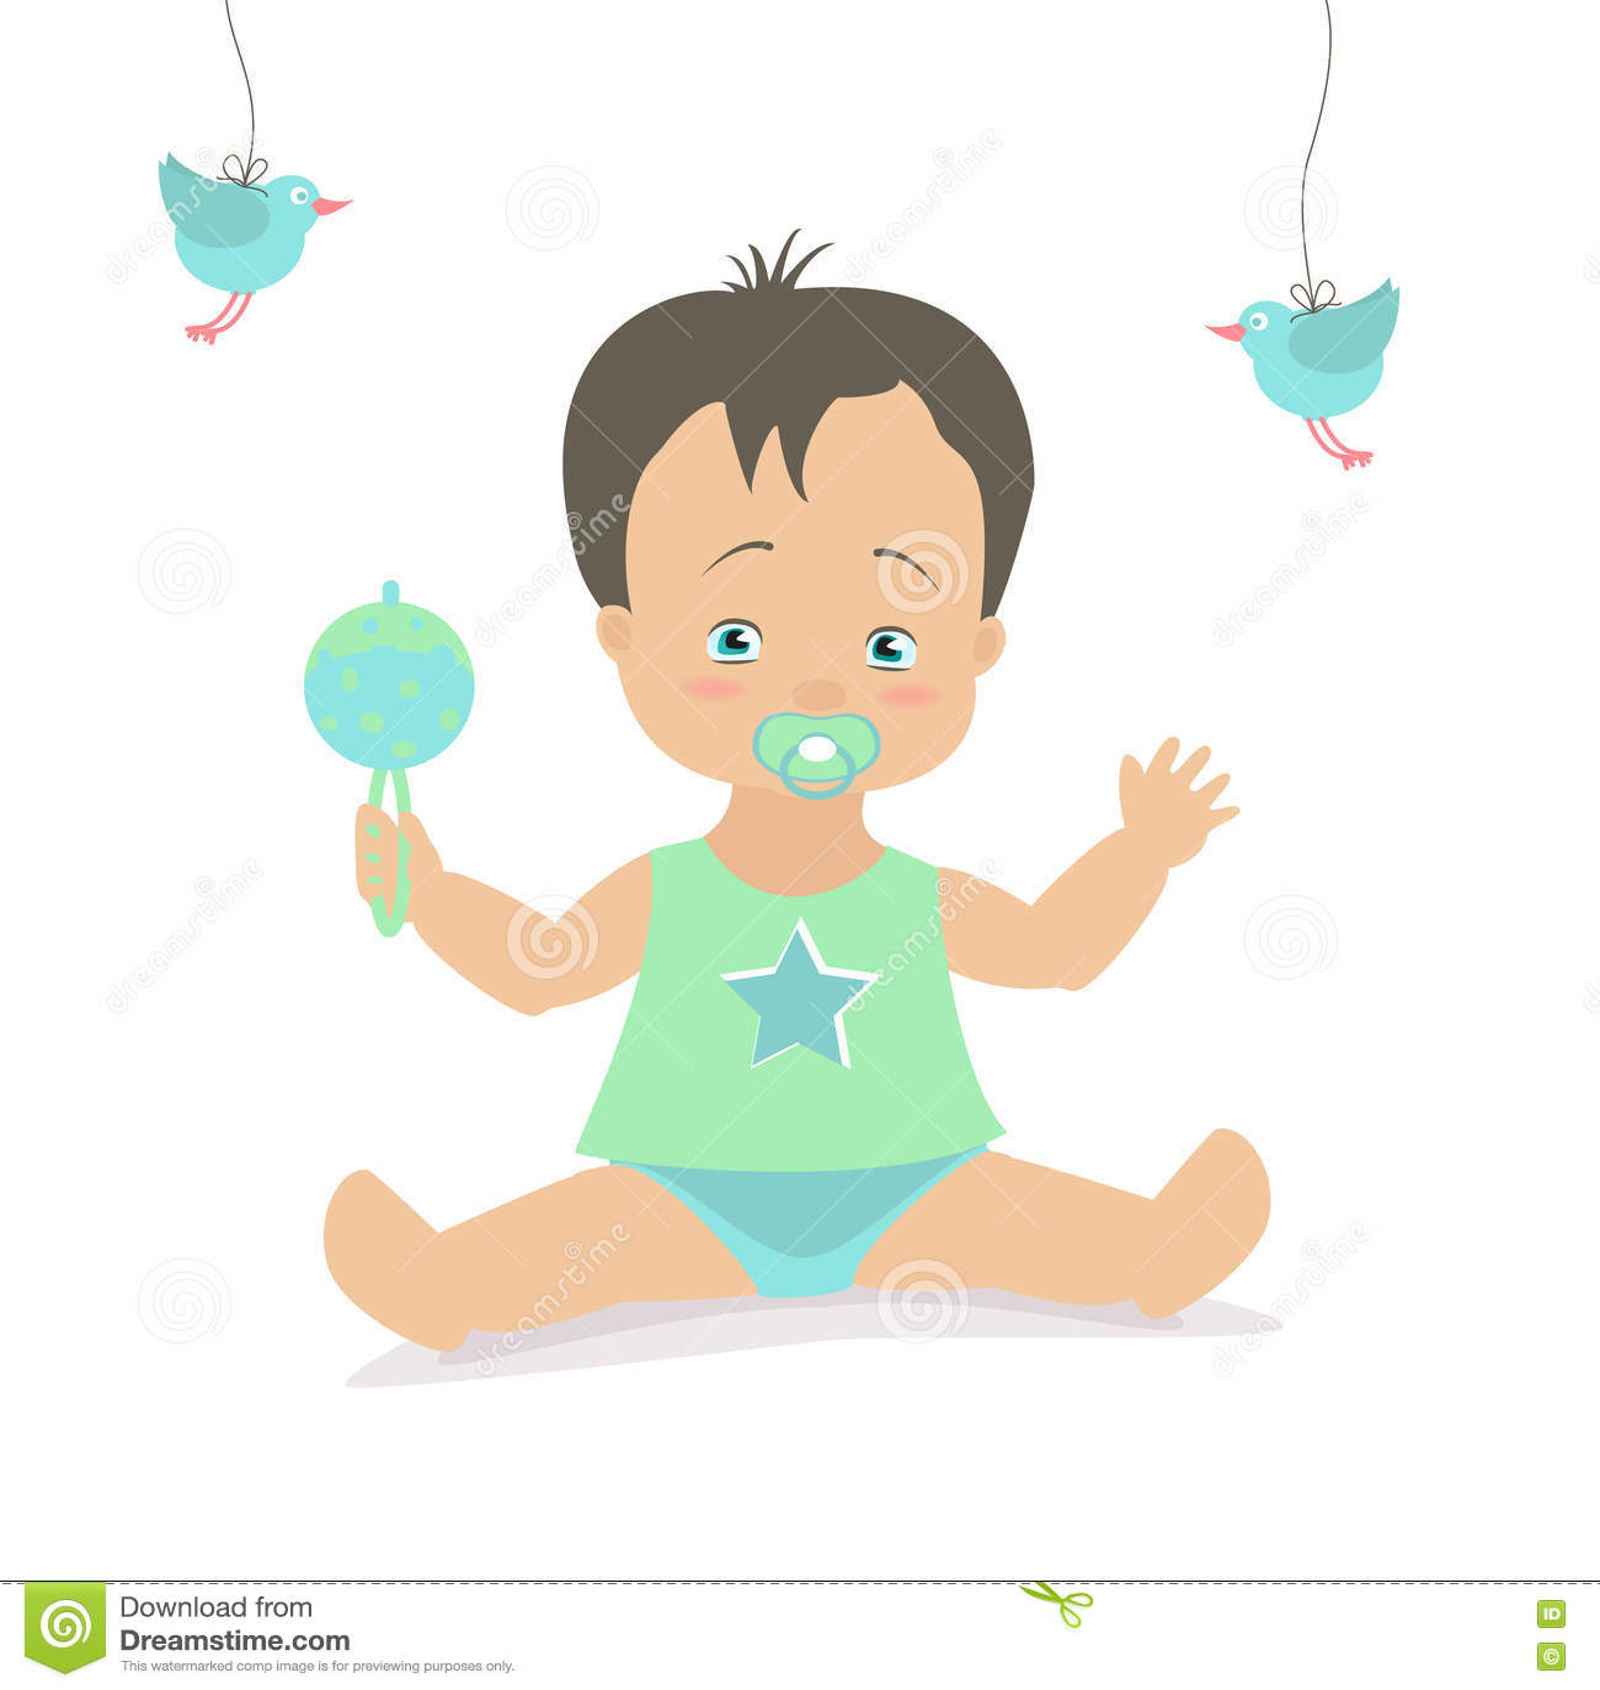 Dessin Bébé Garçon bébé garçon s'asseyant avec un hochet illustration de dessin animé